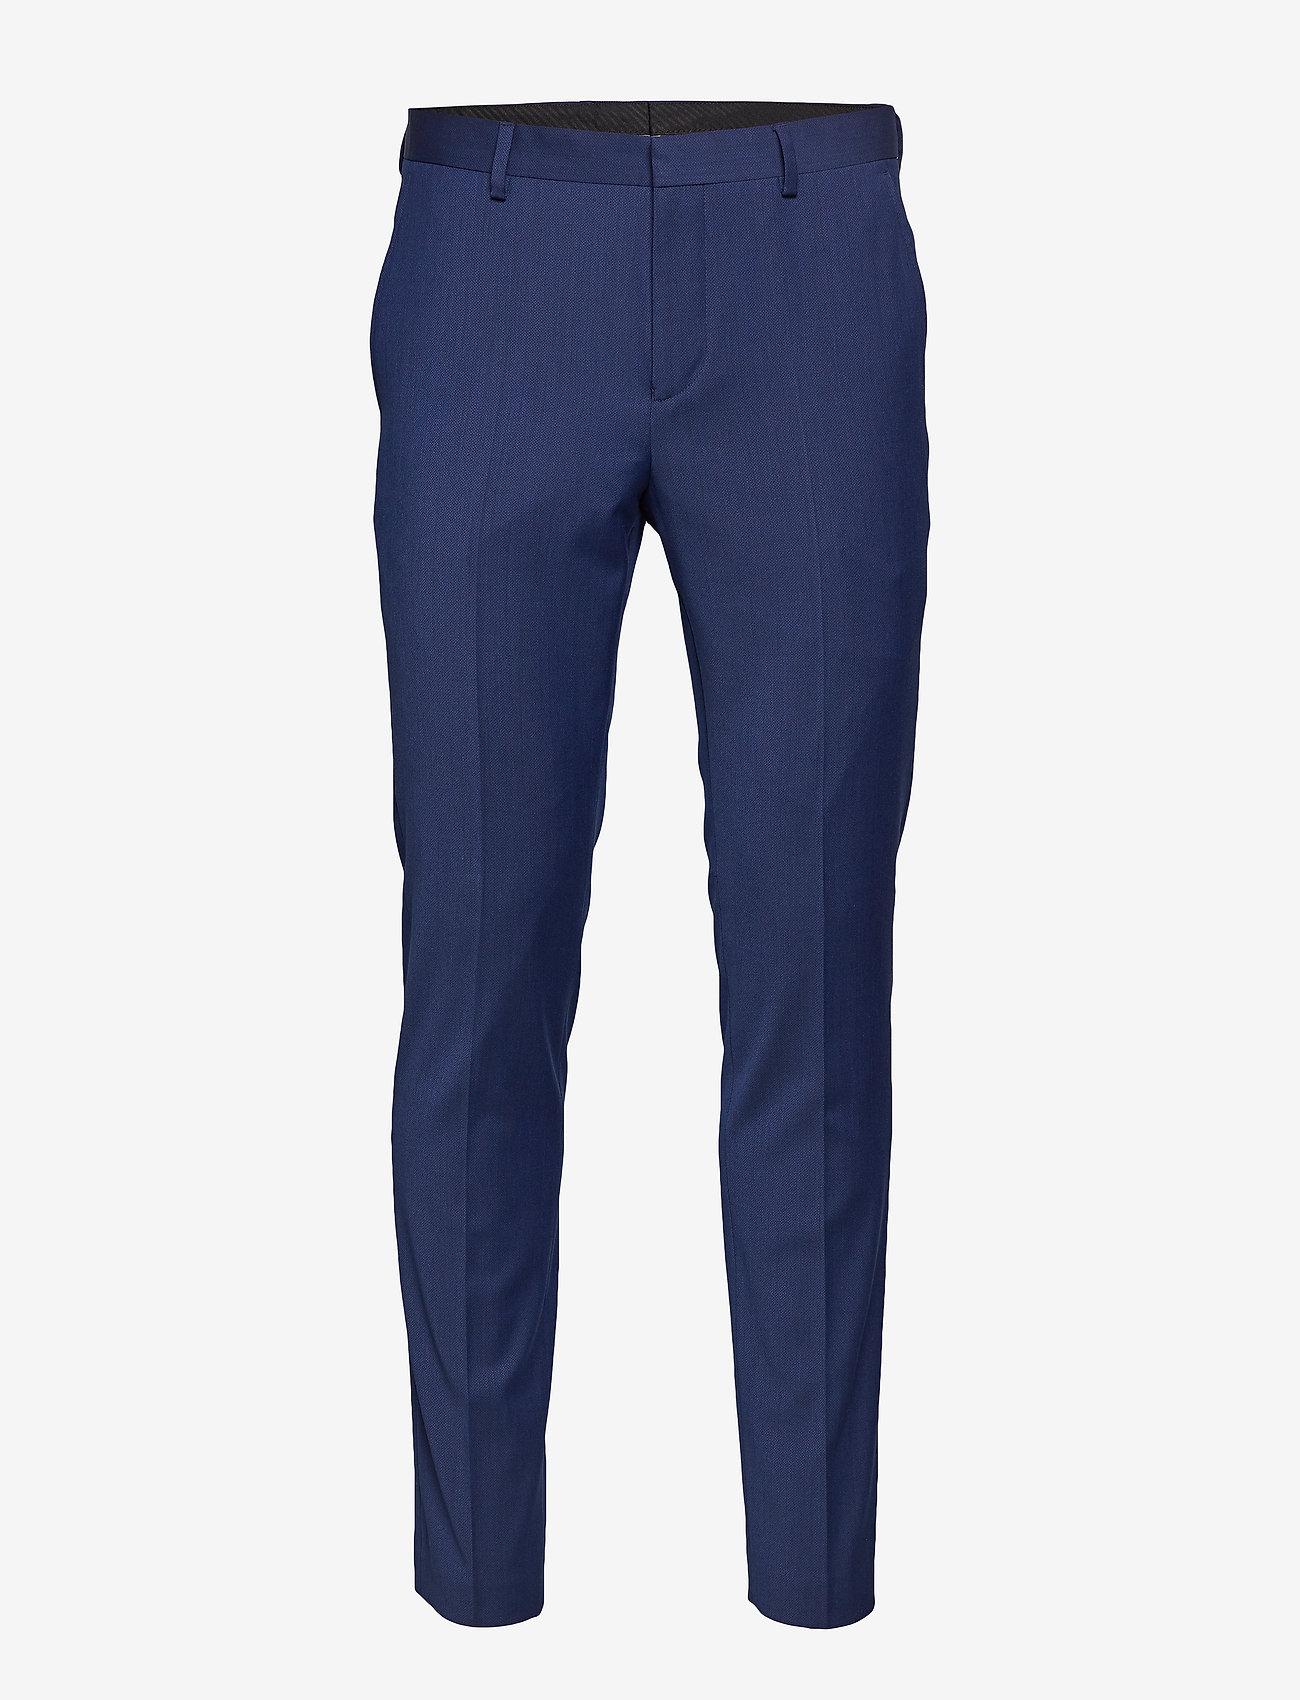 Selected Homme - SLHSLIM-MYLOBILL BLUE TRS B NOOS - suitbukser - blue depths - 0